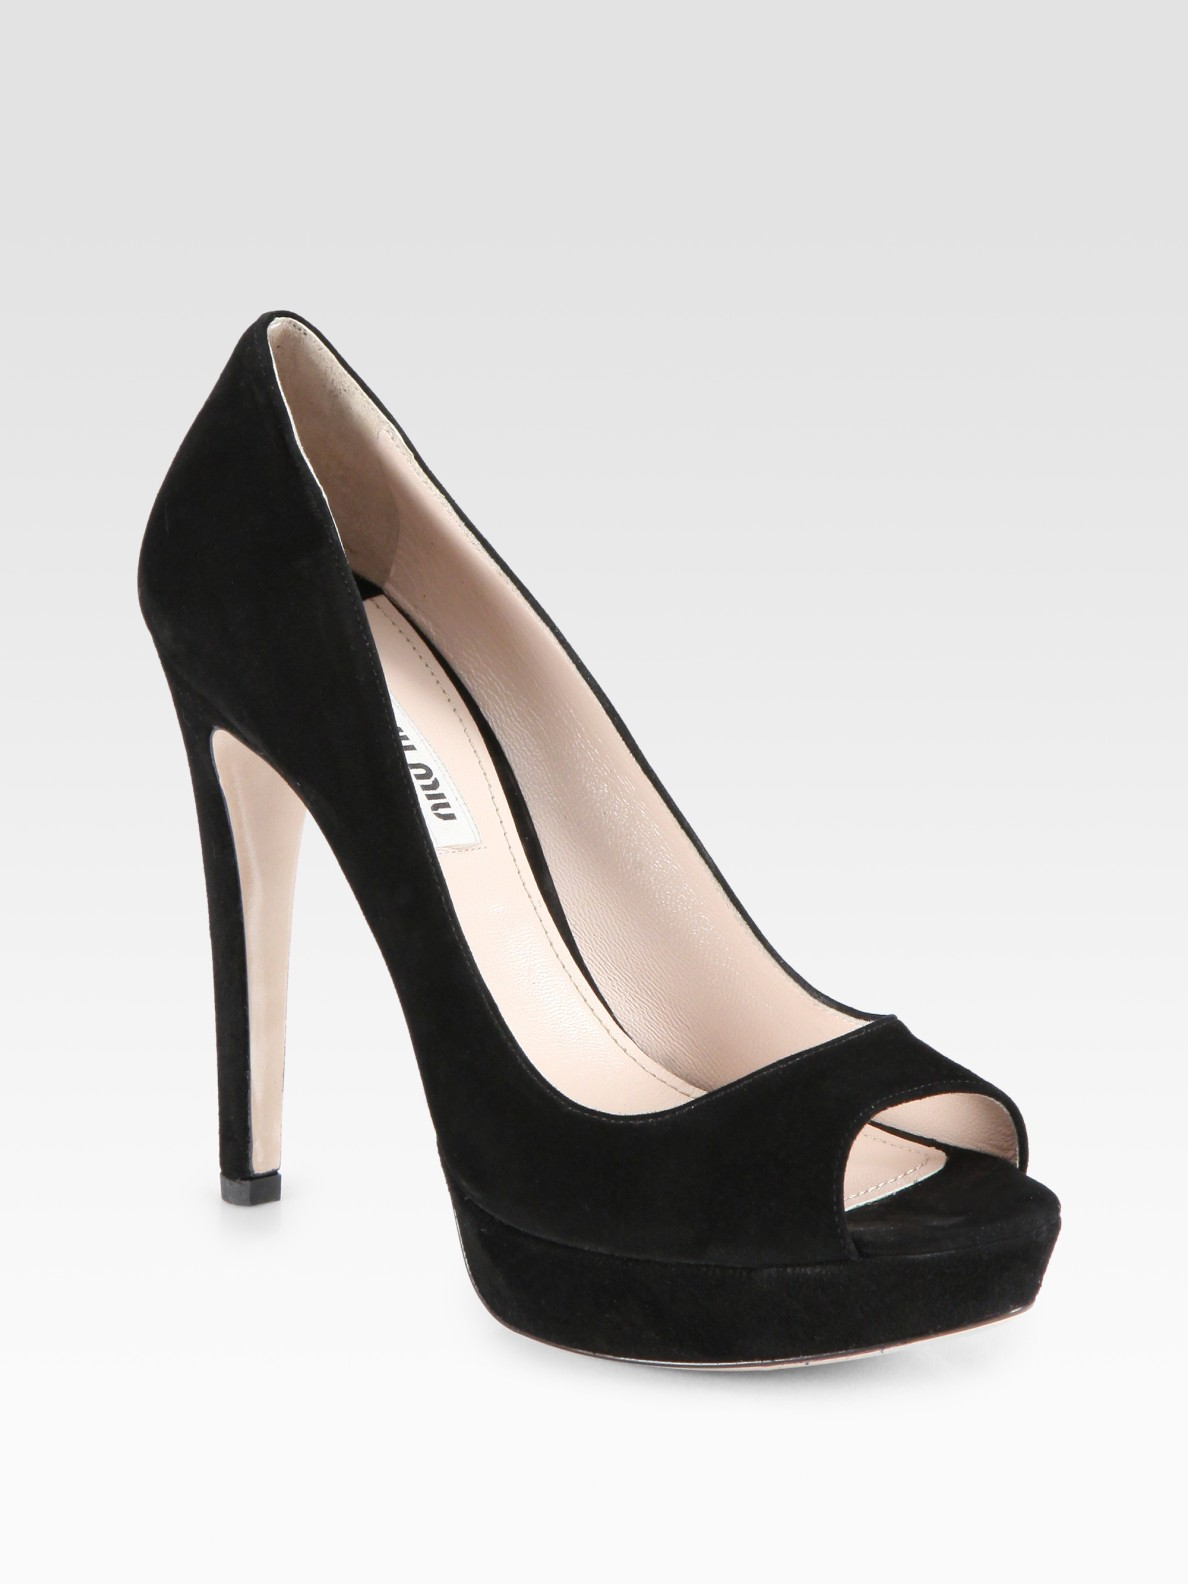 Black Patent Peep Toe Platform Shoes